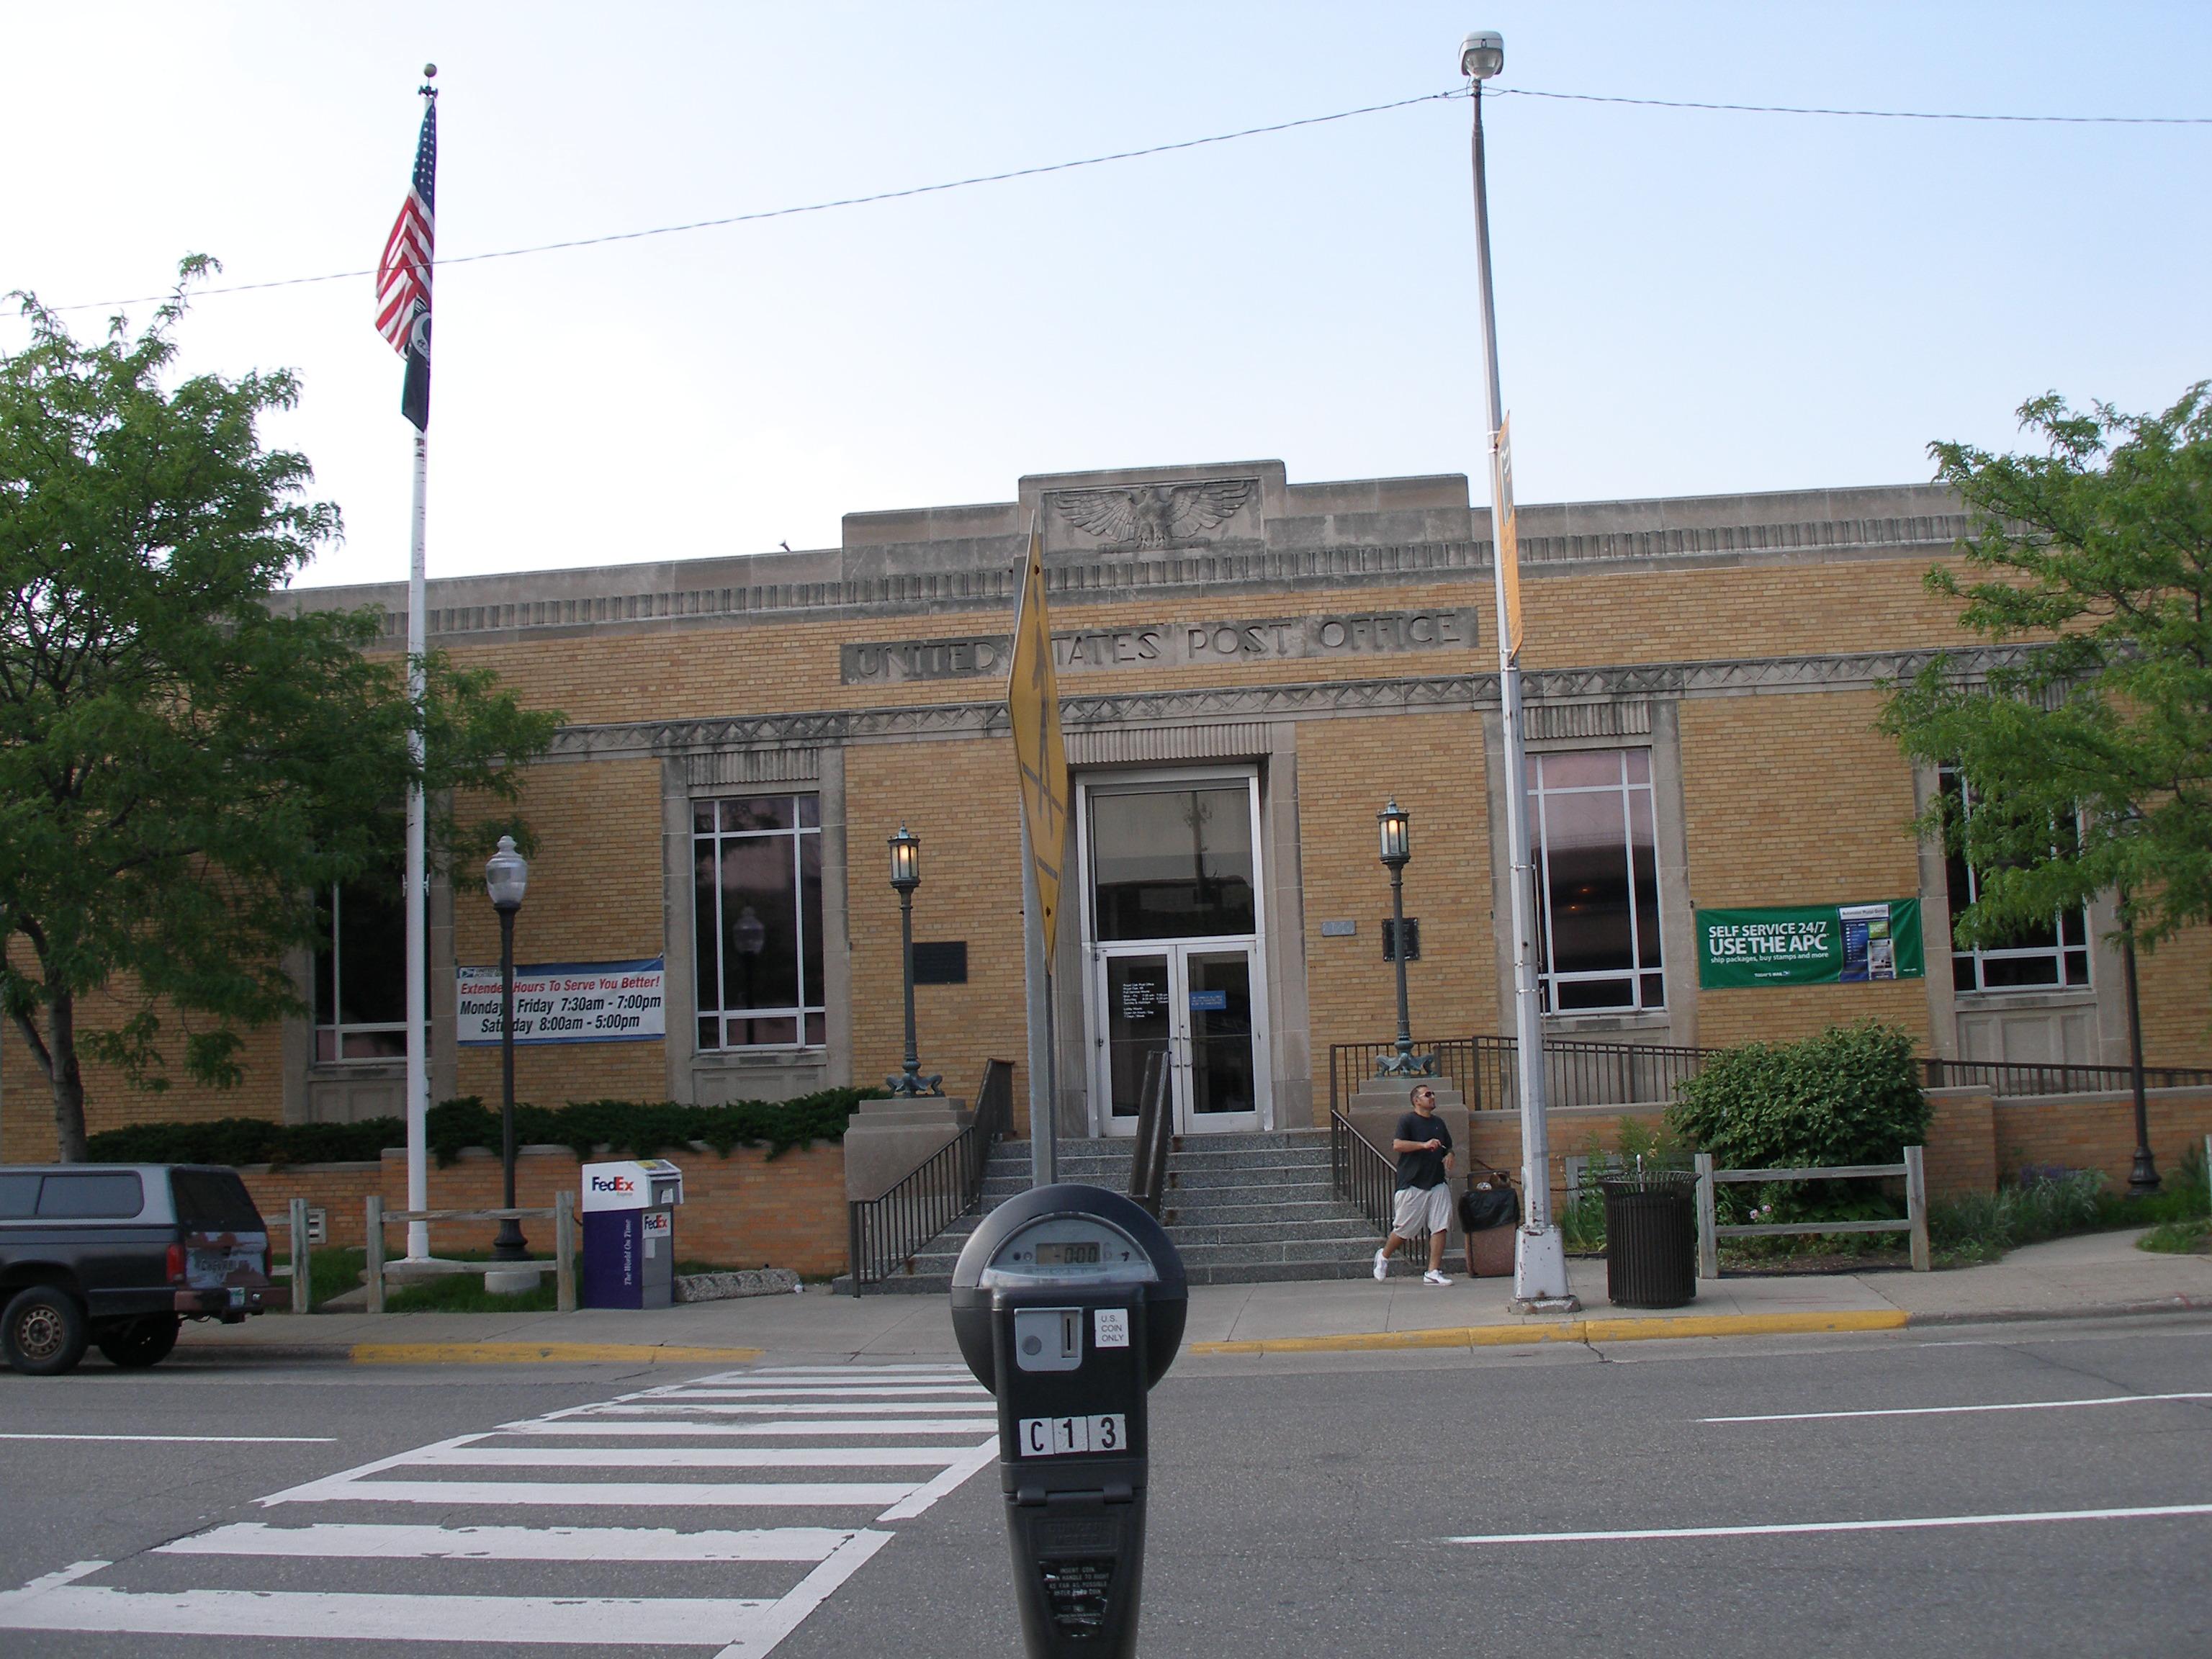 Michigan oakland county franklin - Royaloakpostoffice